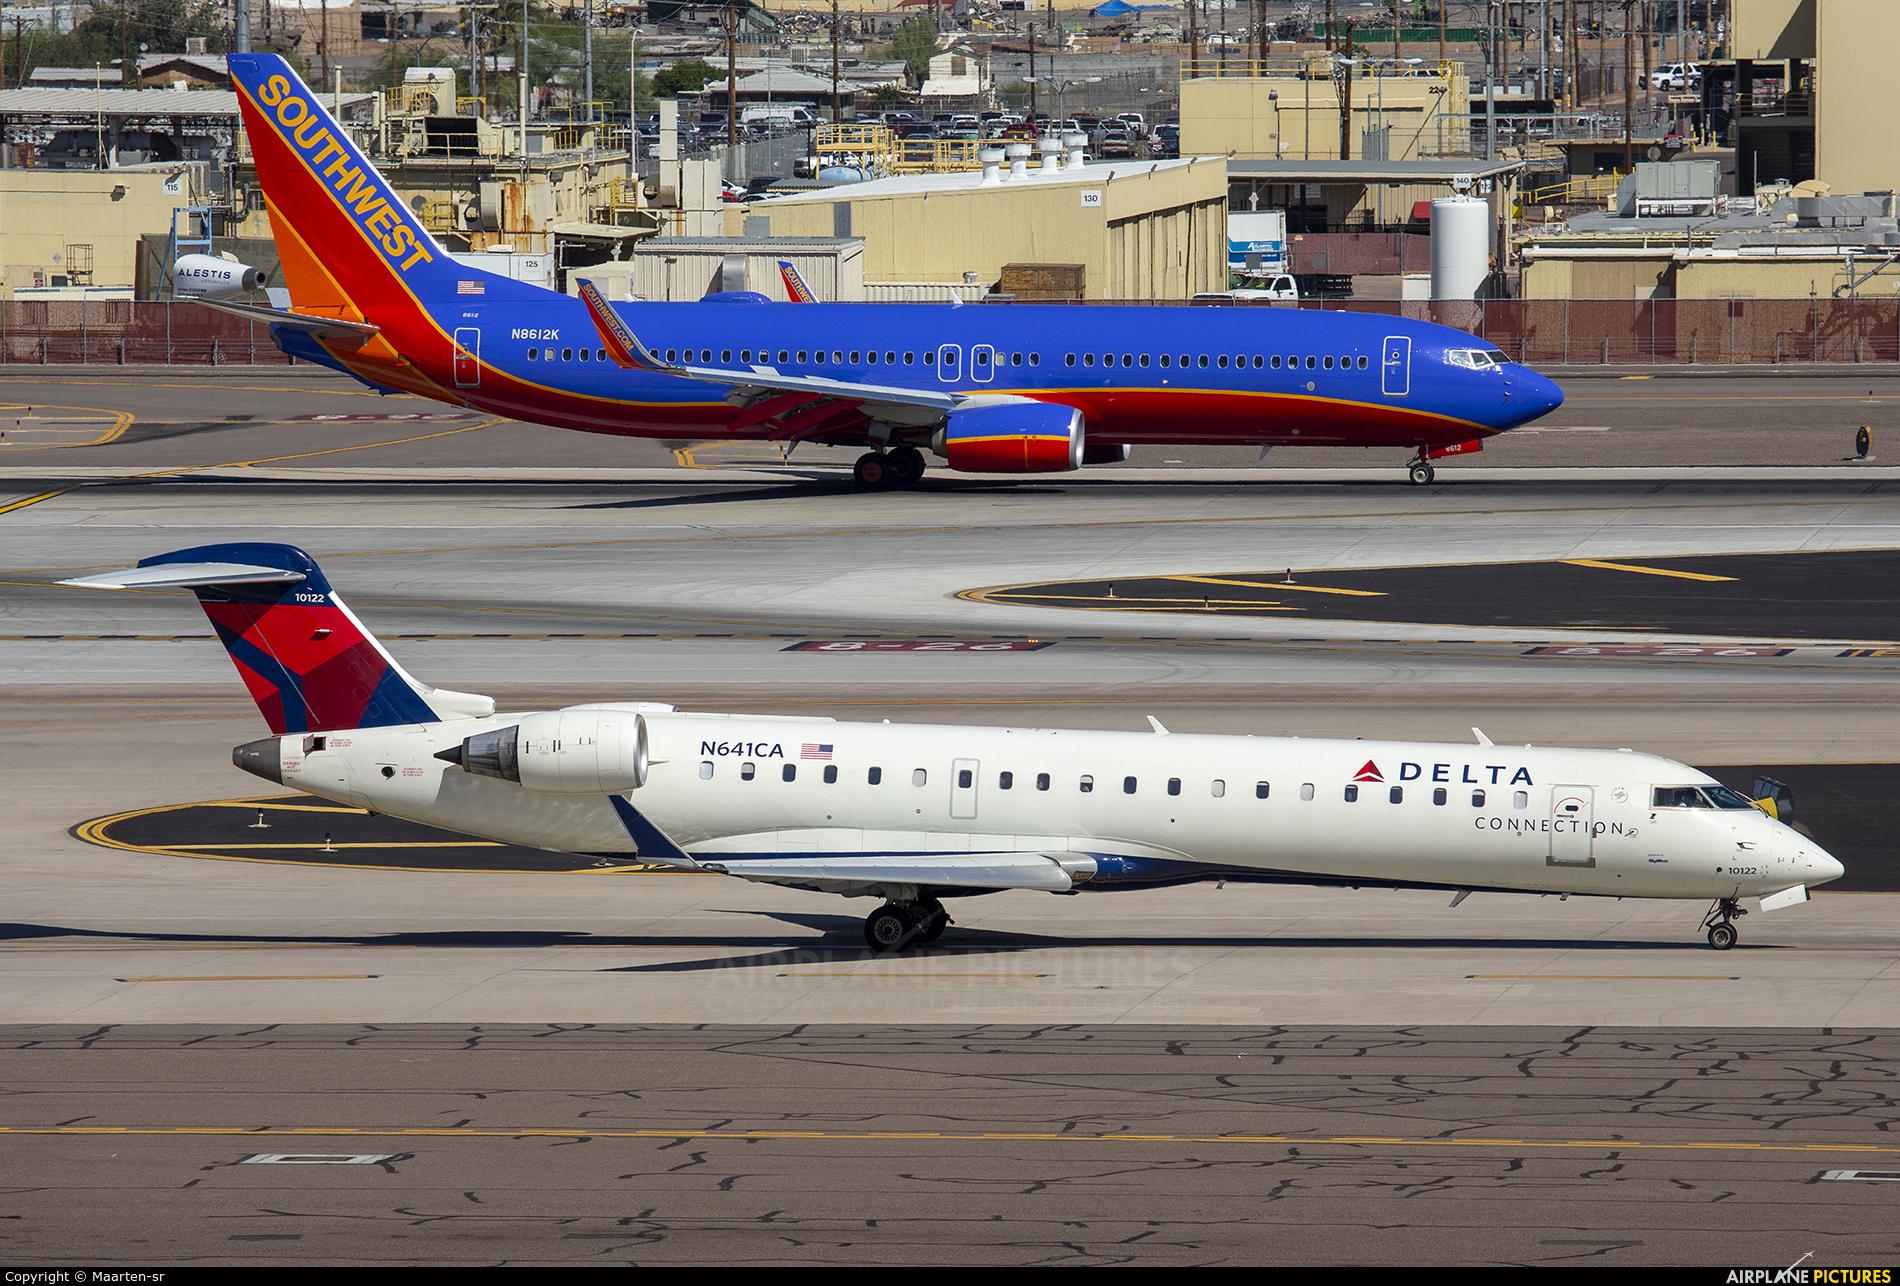 Delta Connection N641CA aircraft at Phoenix - Sky Harbor Intl